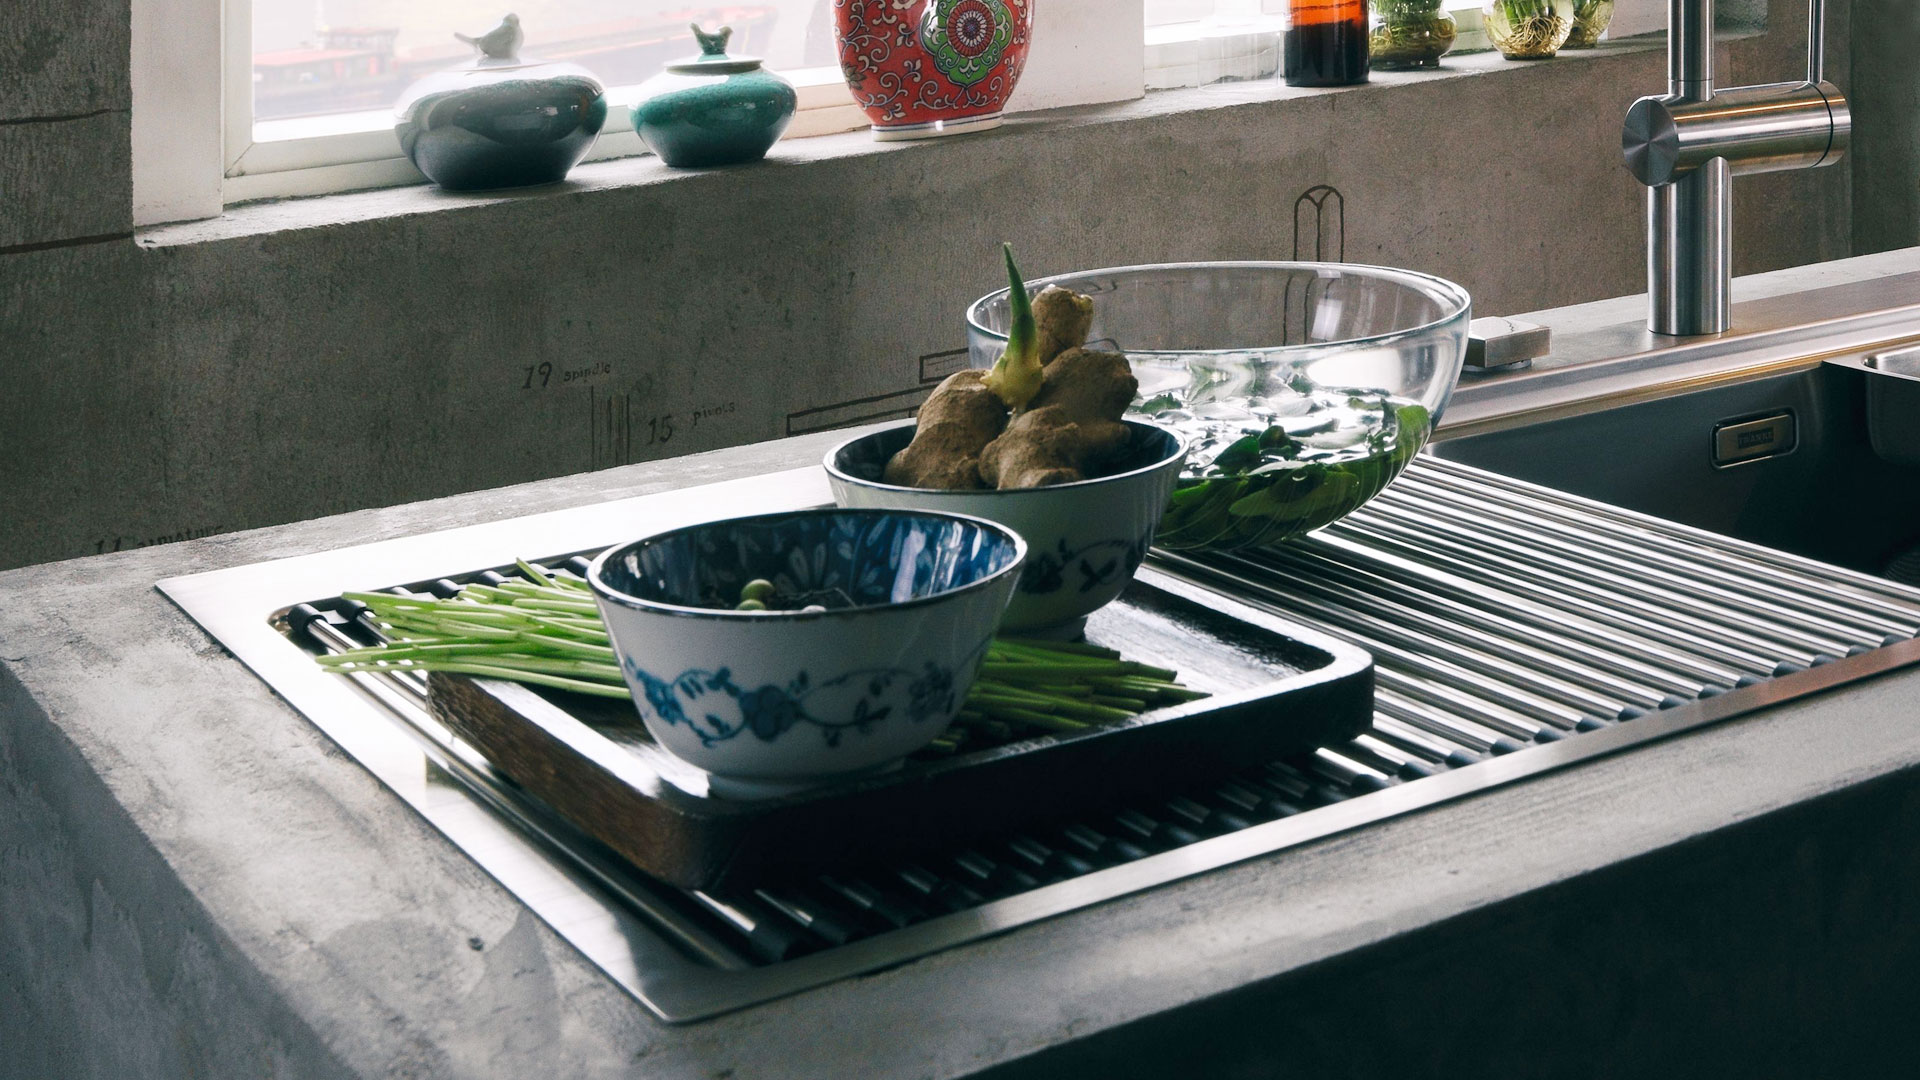 Spulen butter kuchenstudio dresden for Küchenstudio dresden